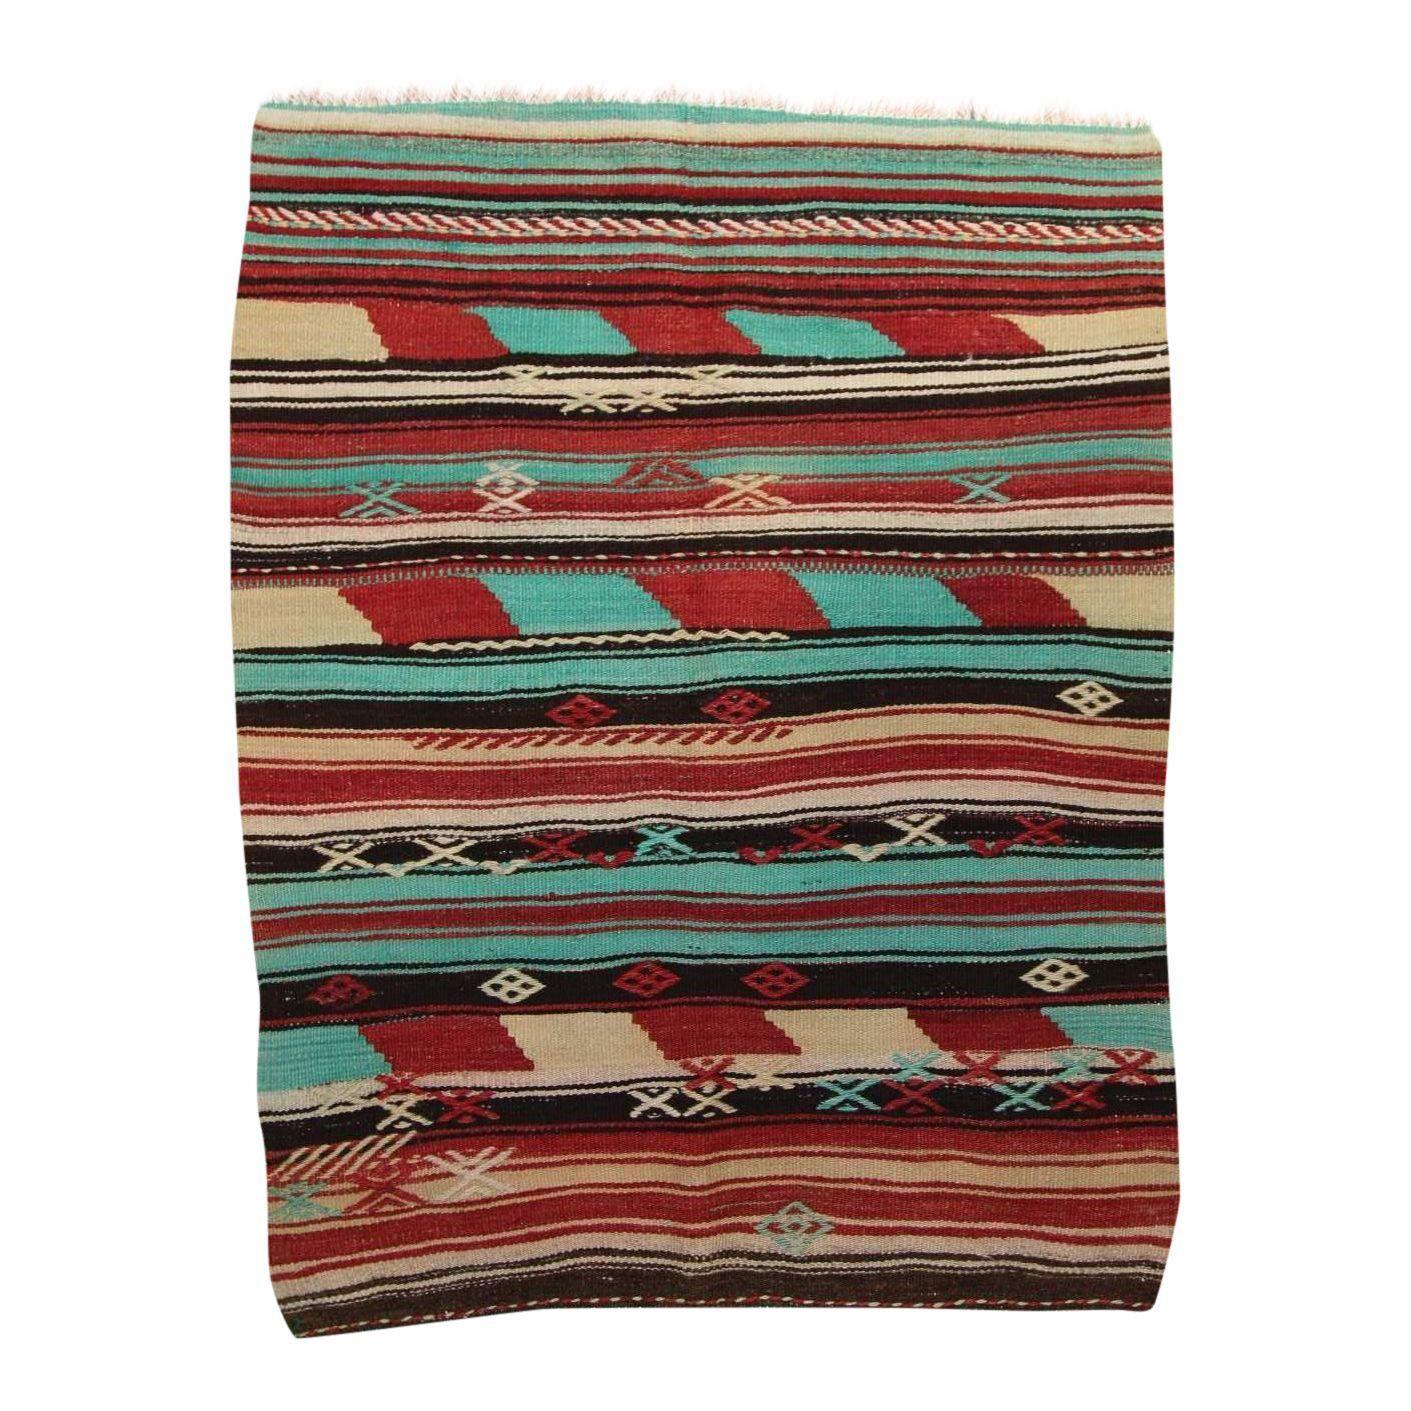 "Image of Kilim Handmade Flat Woven Rug - 2'8""x3'5"""